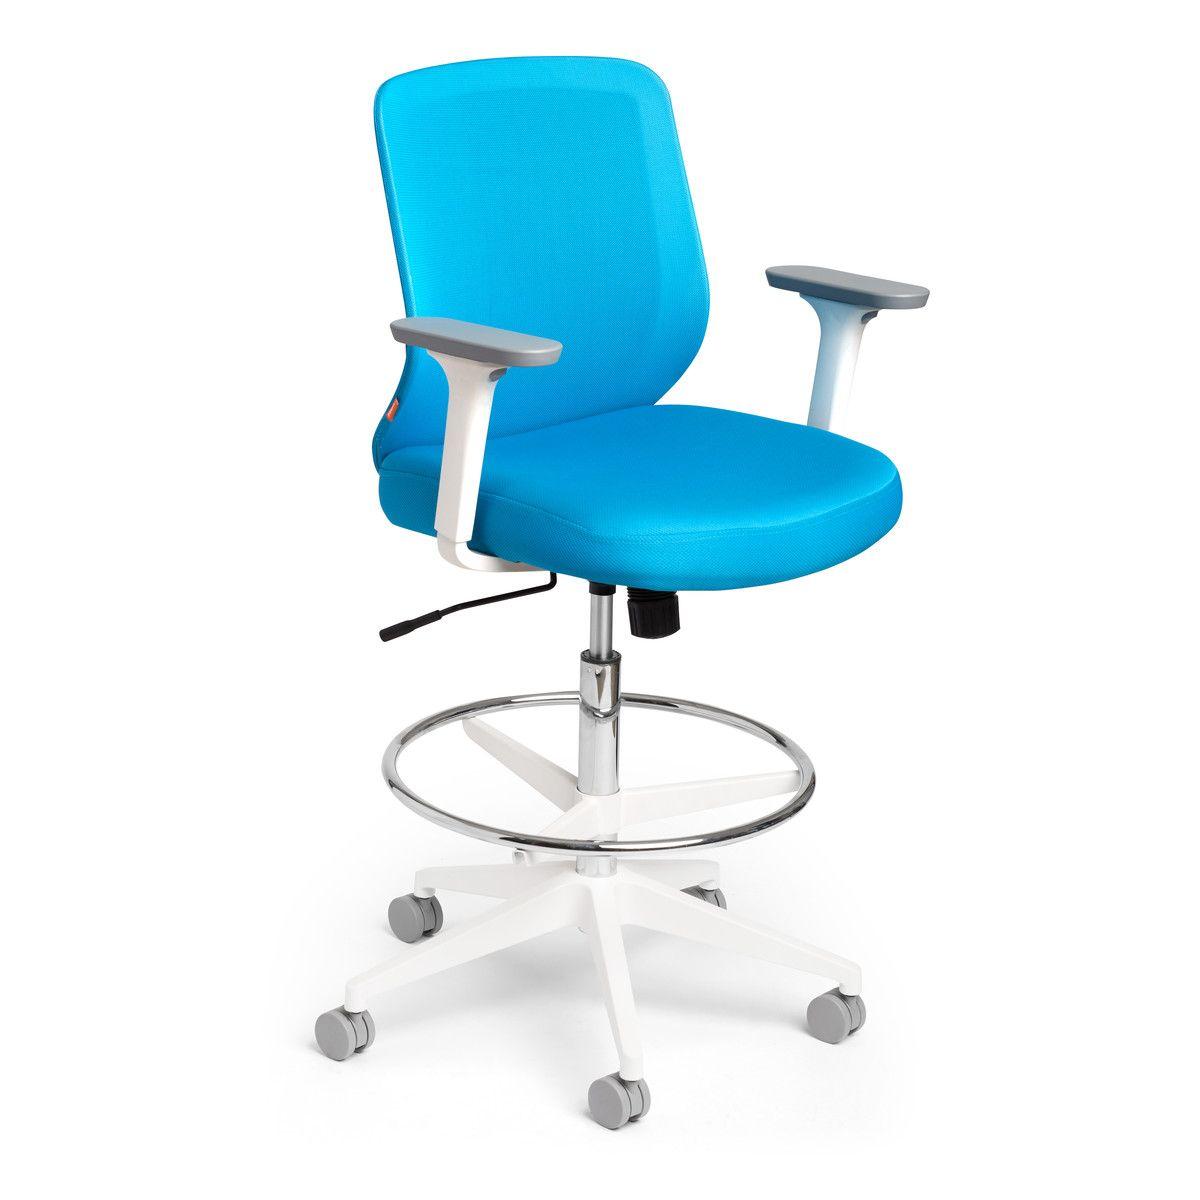 Sensational Pool Blue Max Drafting Chair Mid Back White Frame Modern Uwap Interior Chair Design Uwaporg